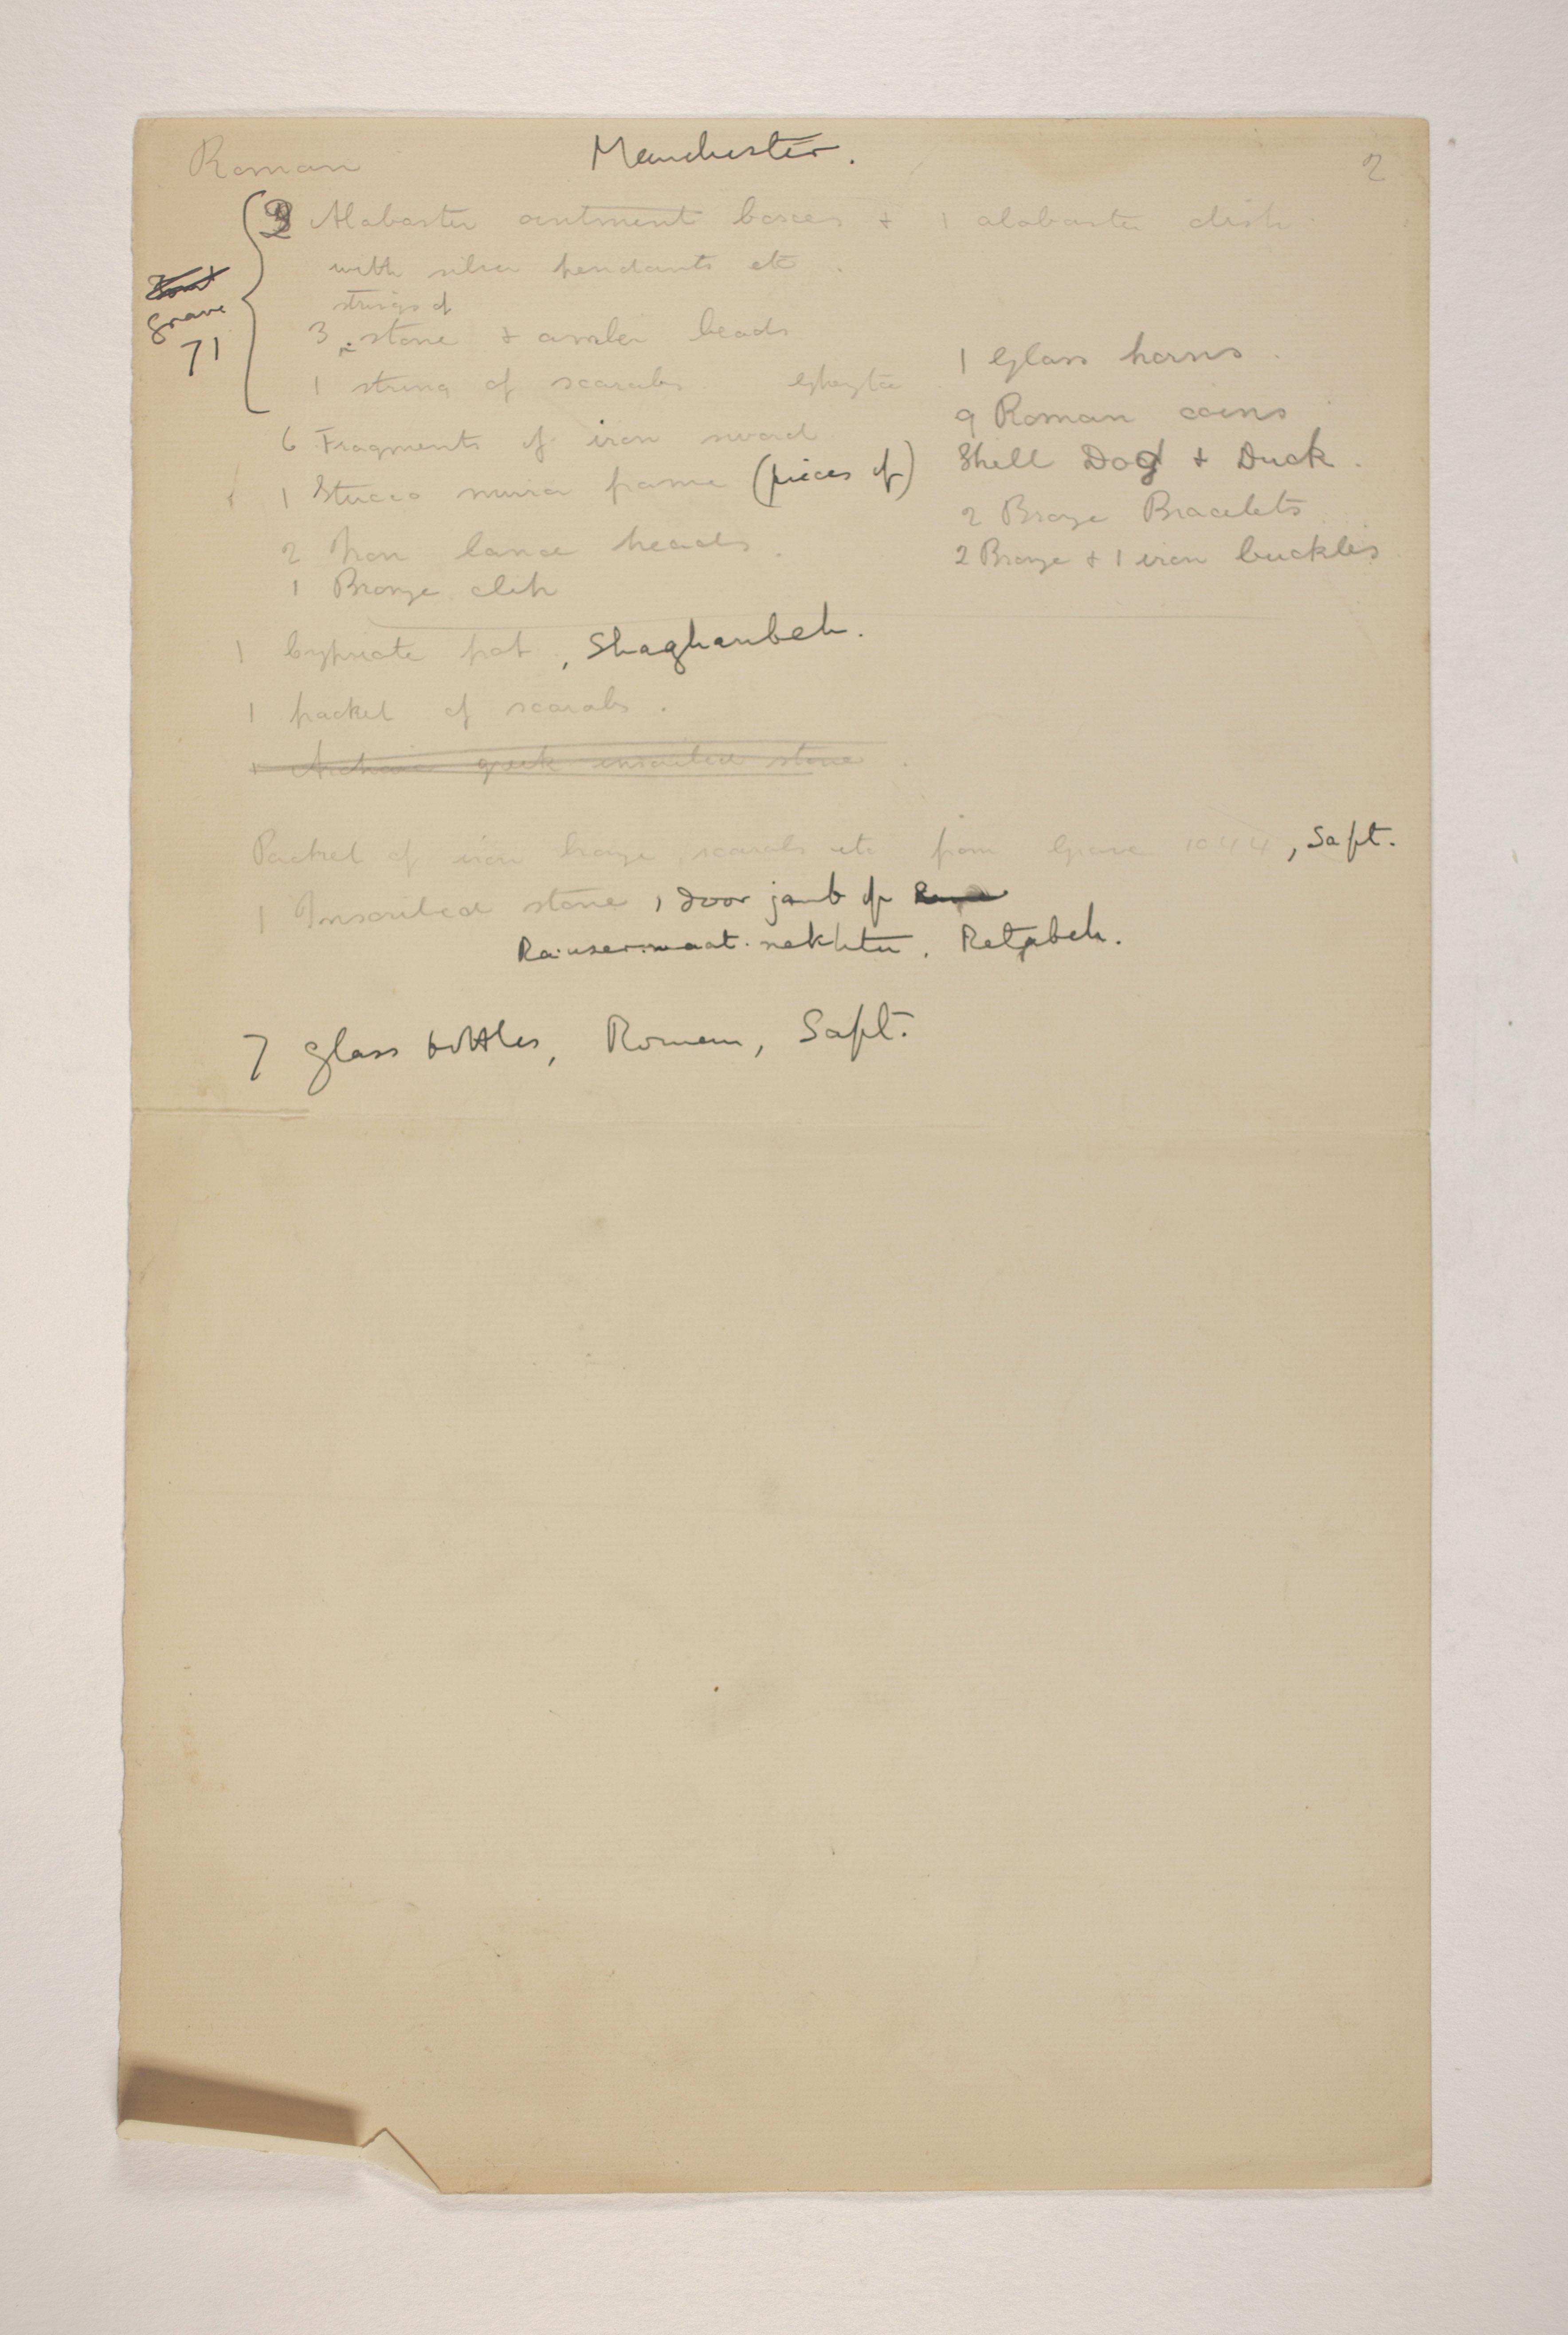 1905-06 Eastern Delta: Belbeis, Tell el-Rataba, Saft el-Hinna, Tell el-Yahudiya, Shaghanbeh, Ghita Individual institution list  PMA/WFP1/D/14/18.2